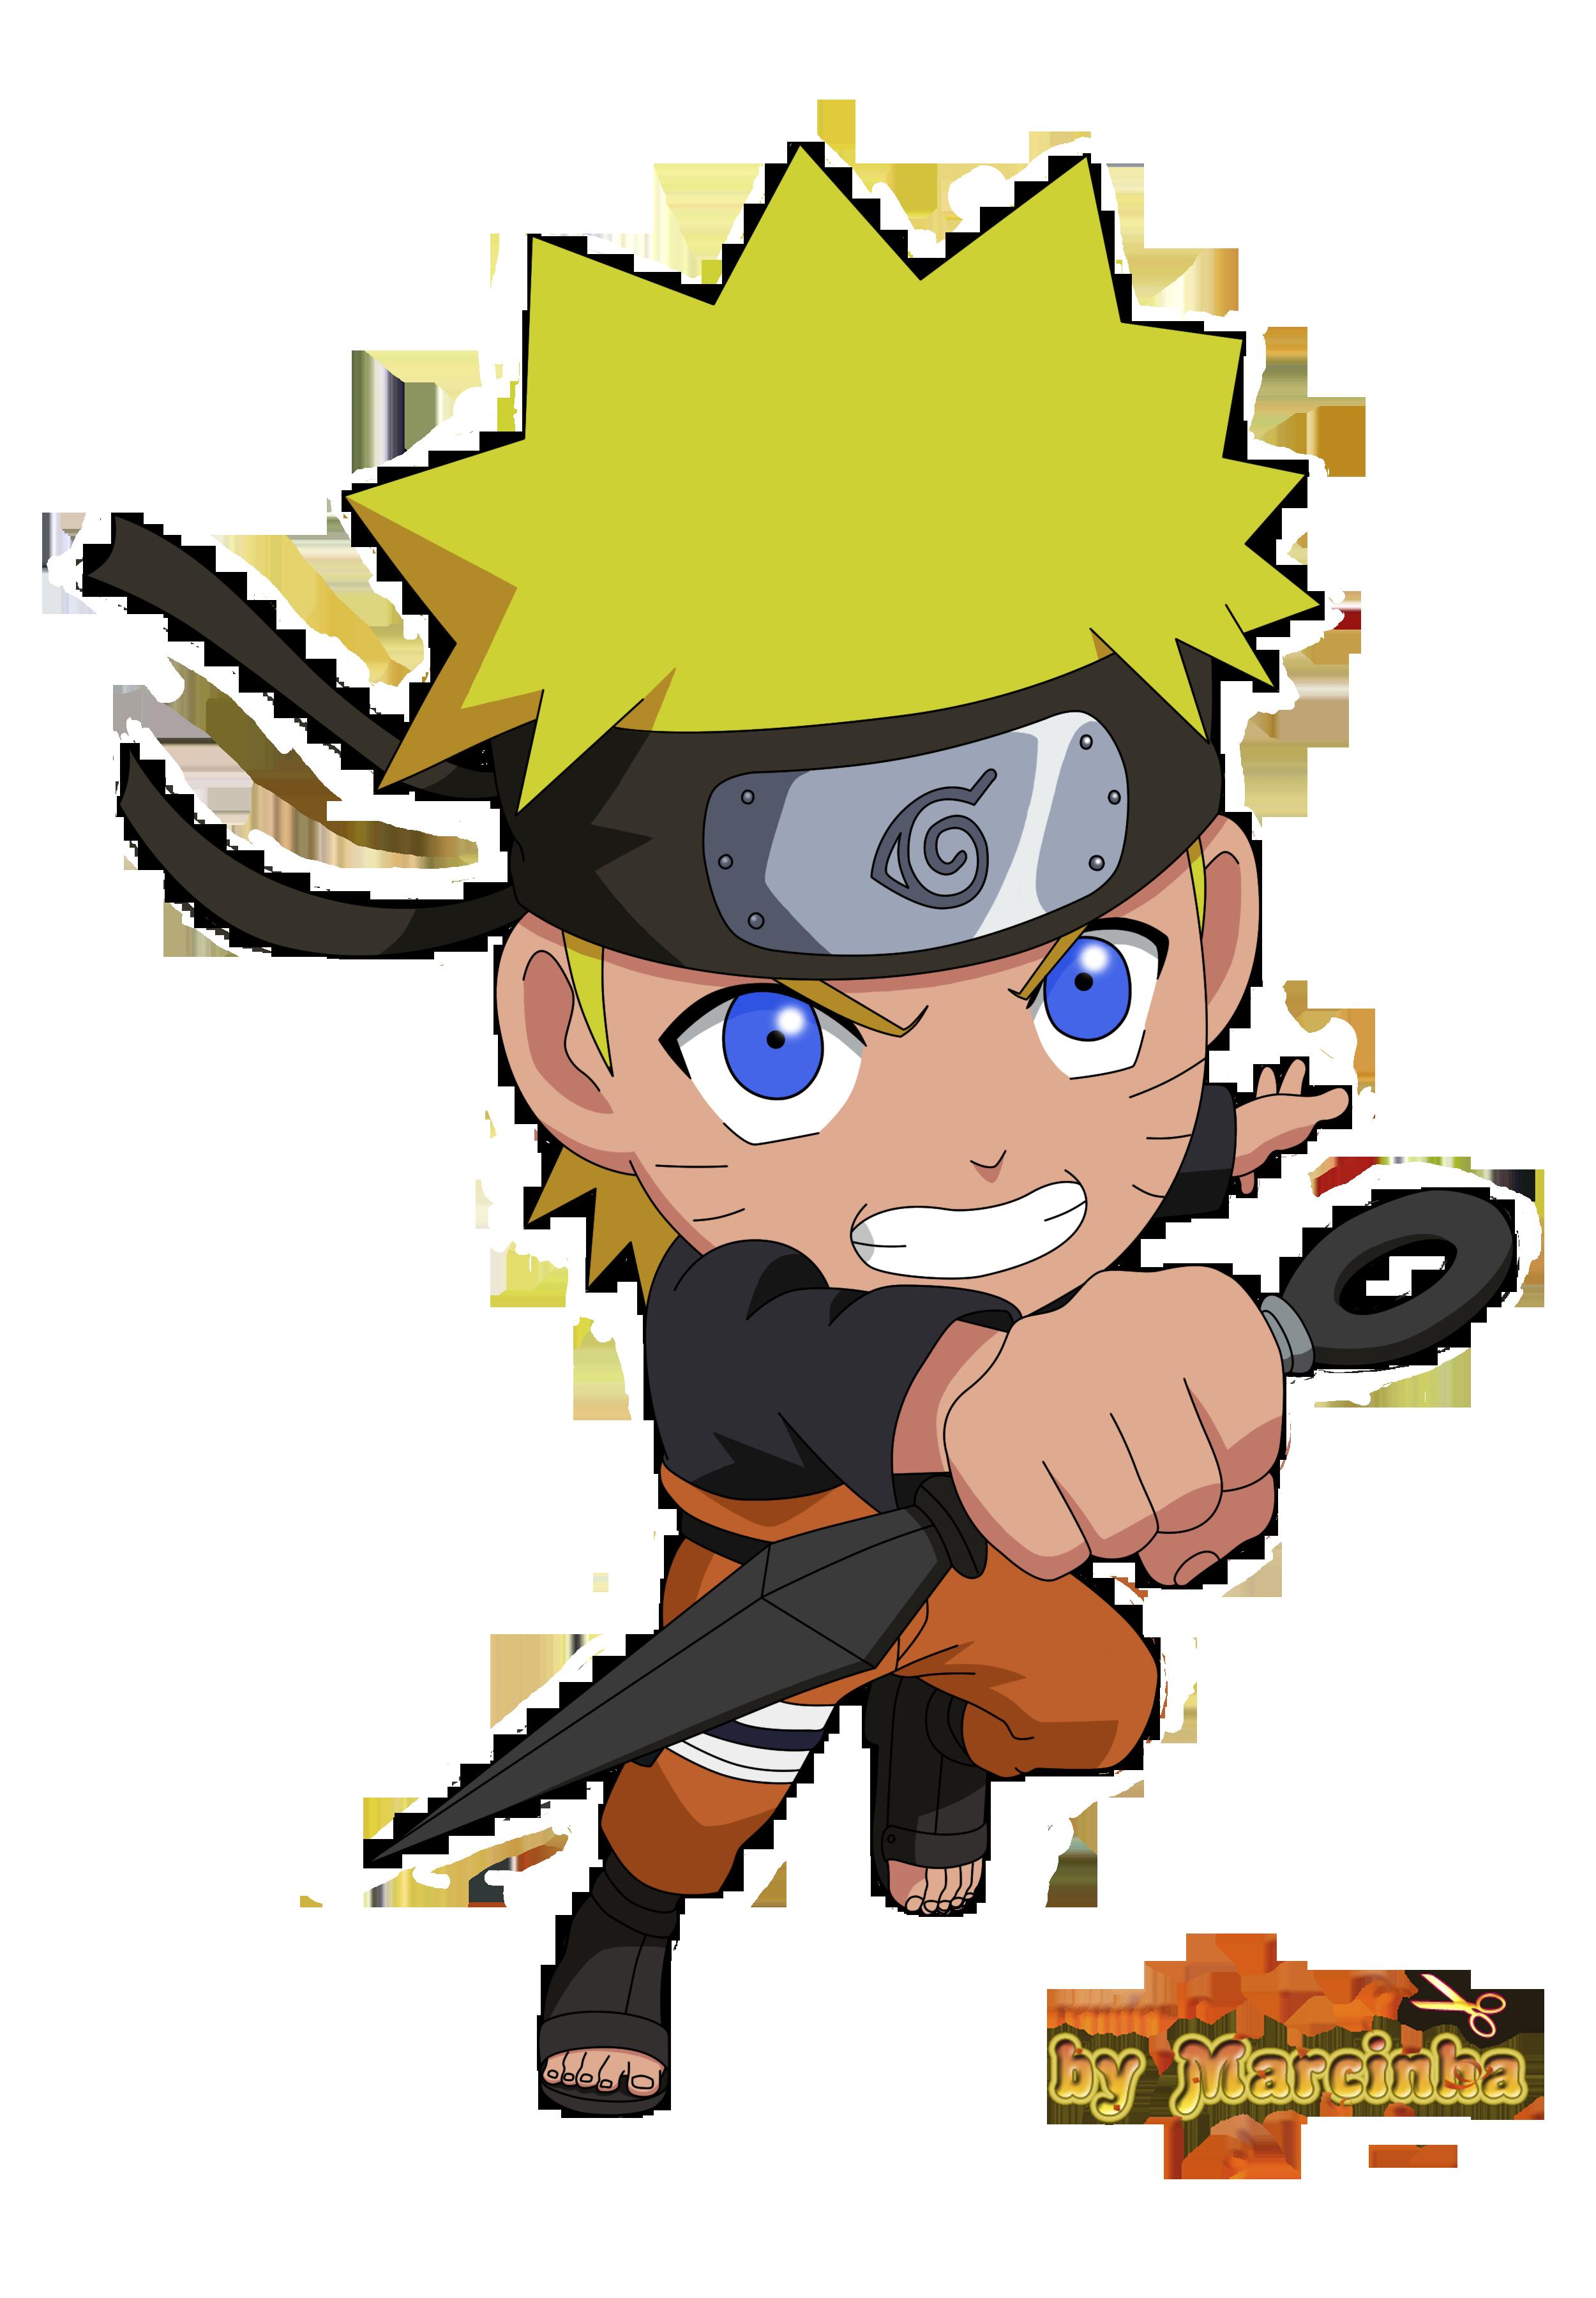 PNG Chibi Naruto Shippuden by Marcinha20 on DeviantArt